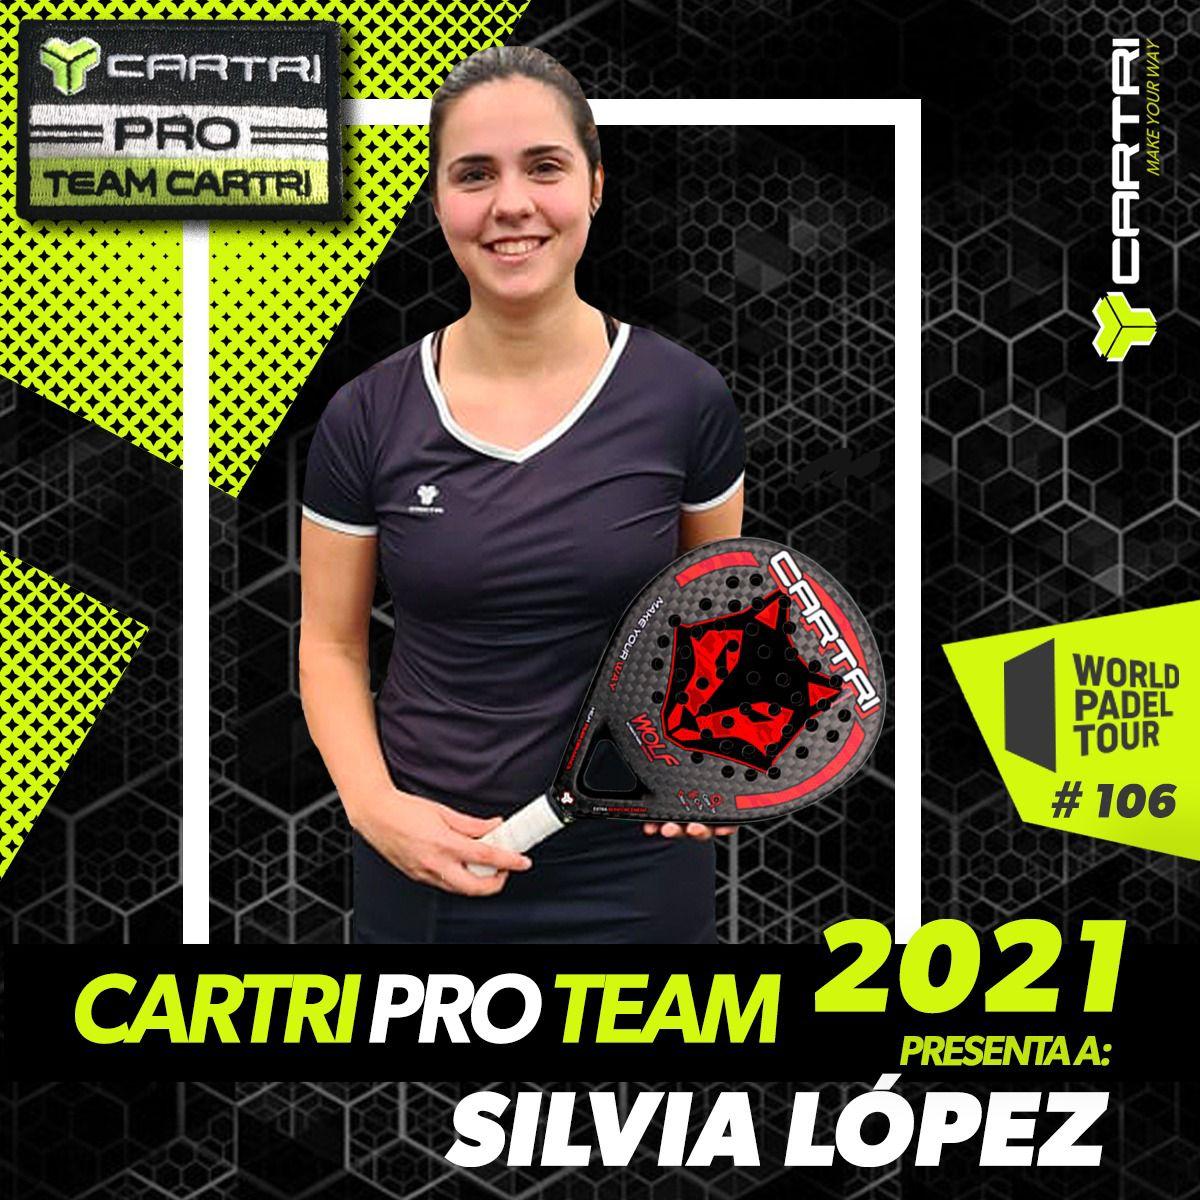 Silvia Lopez Cartri Pro Team 2021